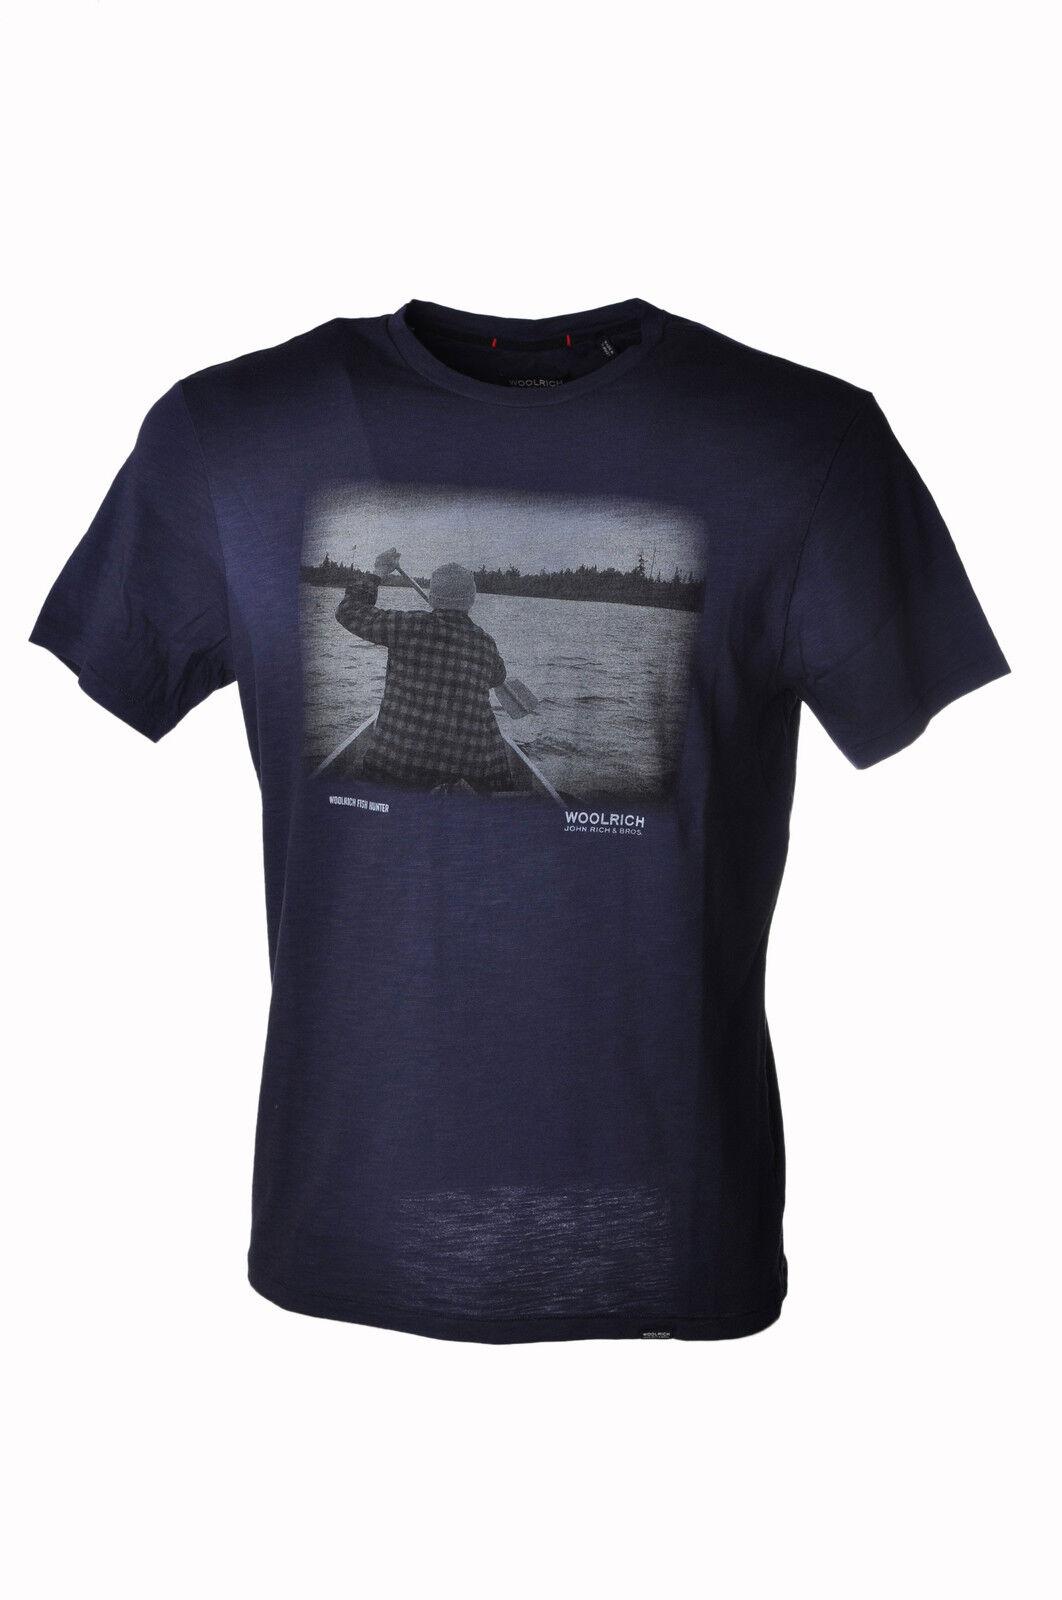 Woolrich - Topwear-T-shirts - Uomo - Blu - 3563411H184425